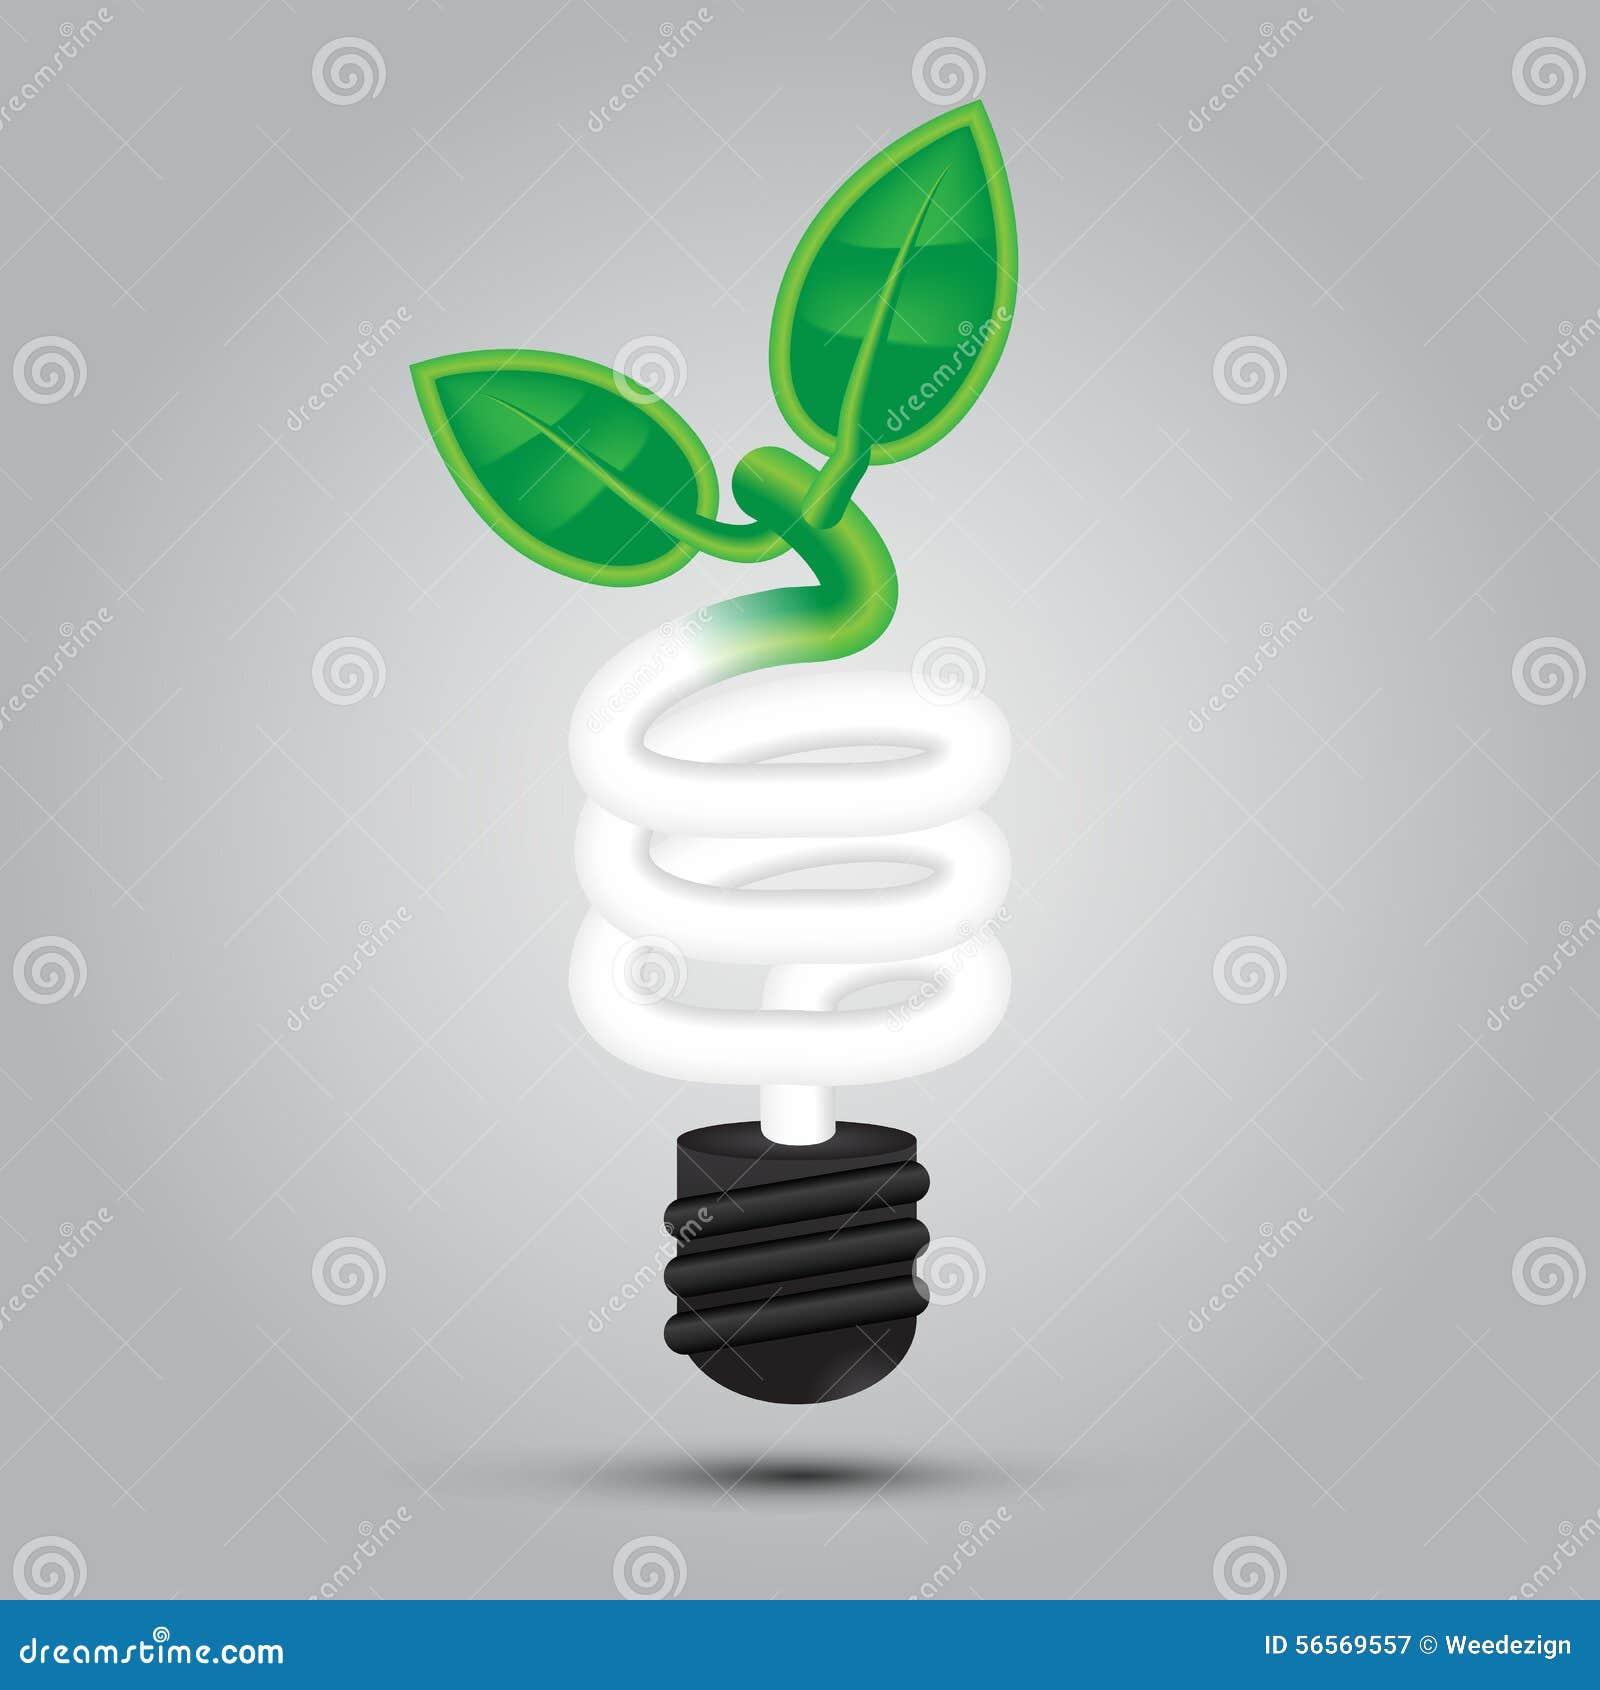 Download Το διάνυσμα, πηγαίνει βολβός πράσινου φωτός Διανυσματική απεικόνιση - εικονογραφία από περιβάλλον, εικονίδιο: 56569557